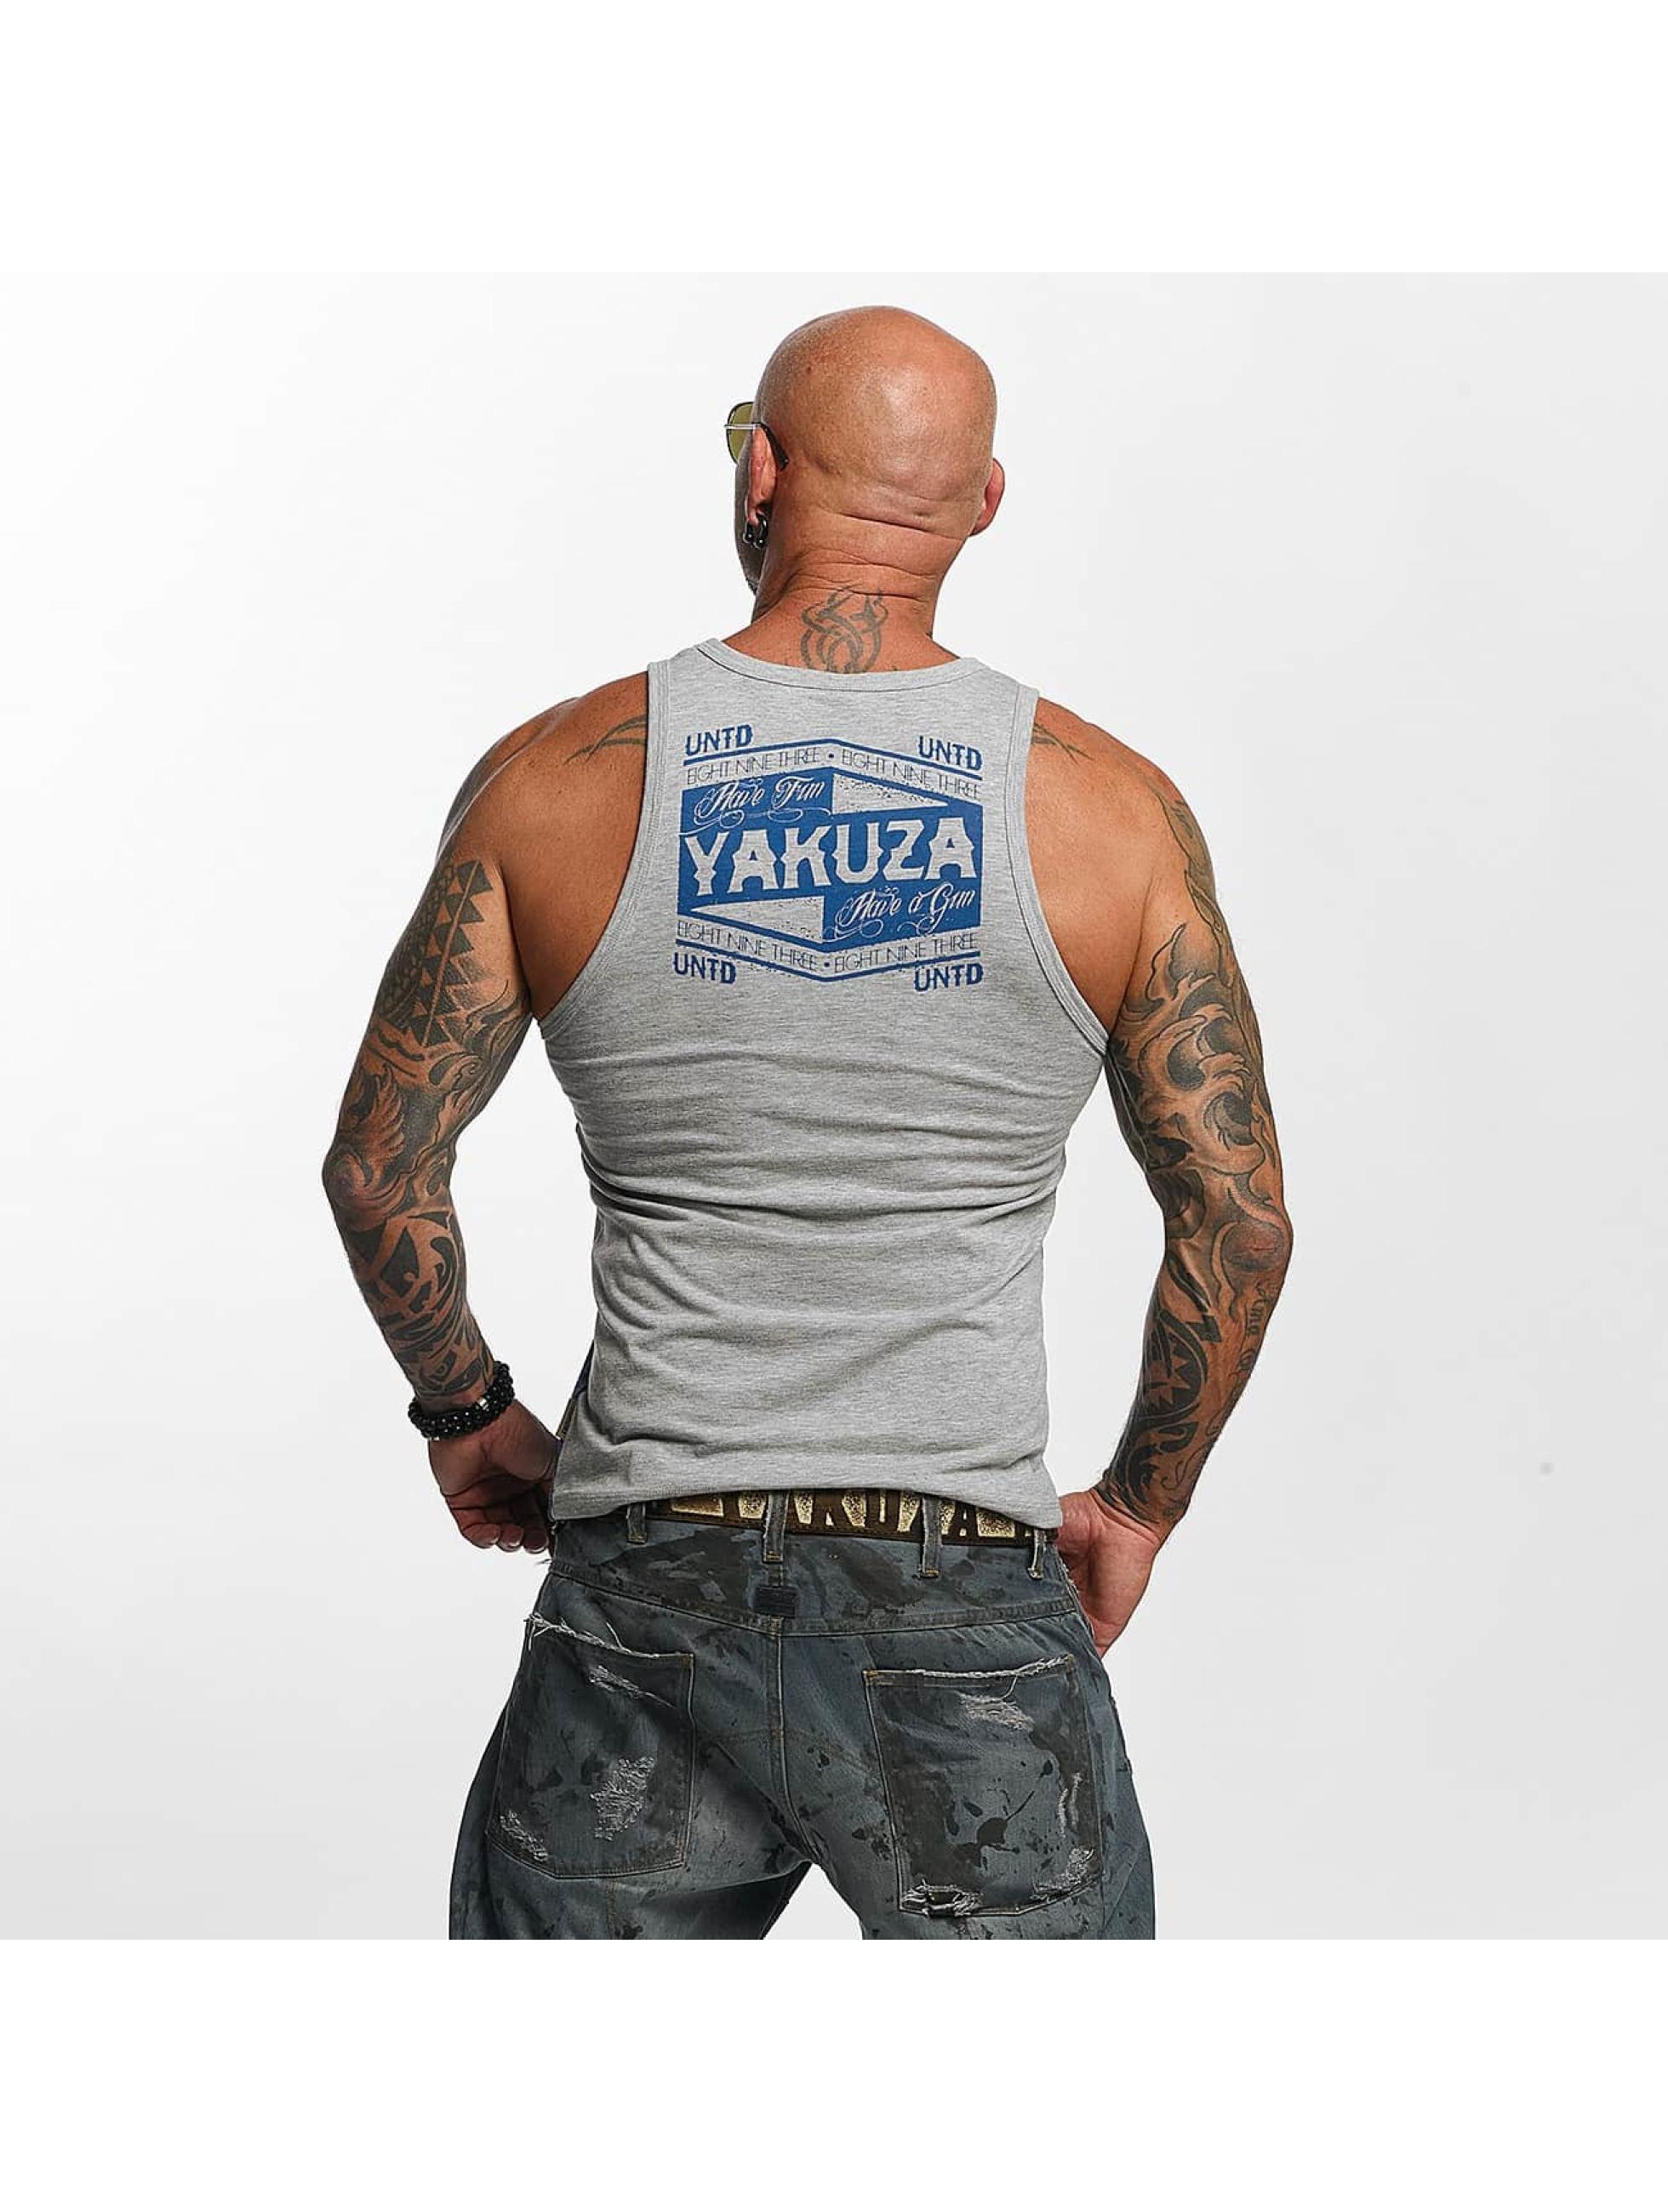 Yakuza Tank Tops Untd gray